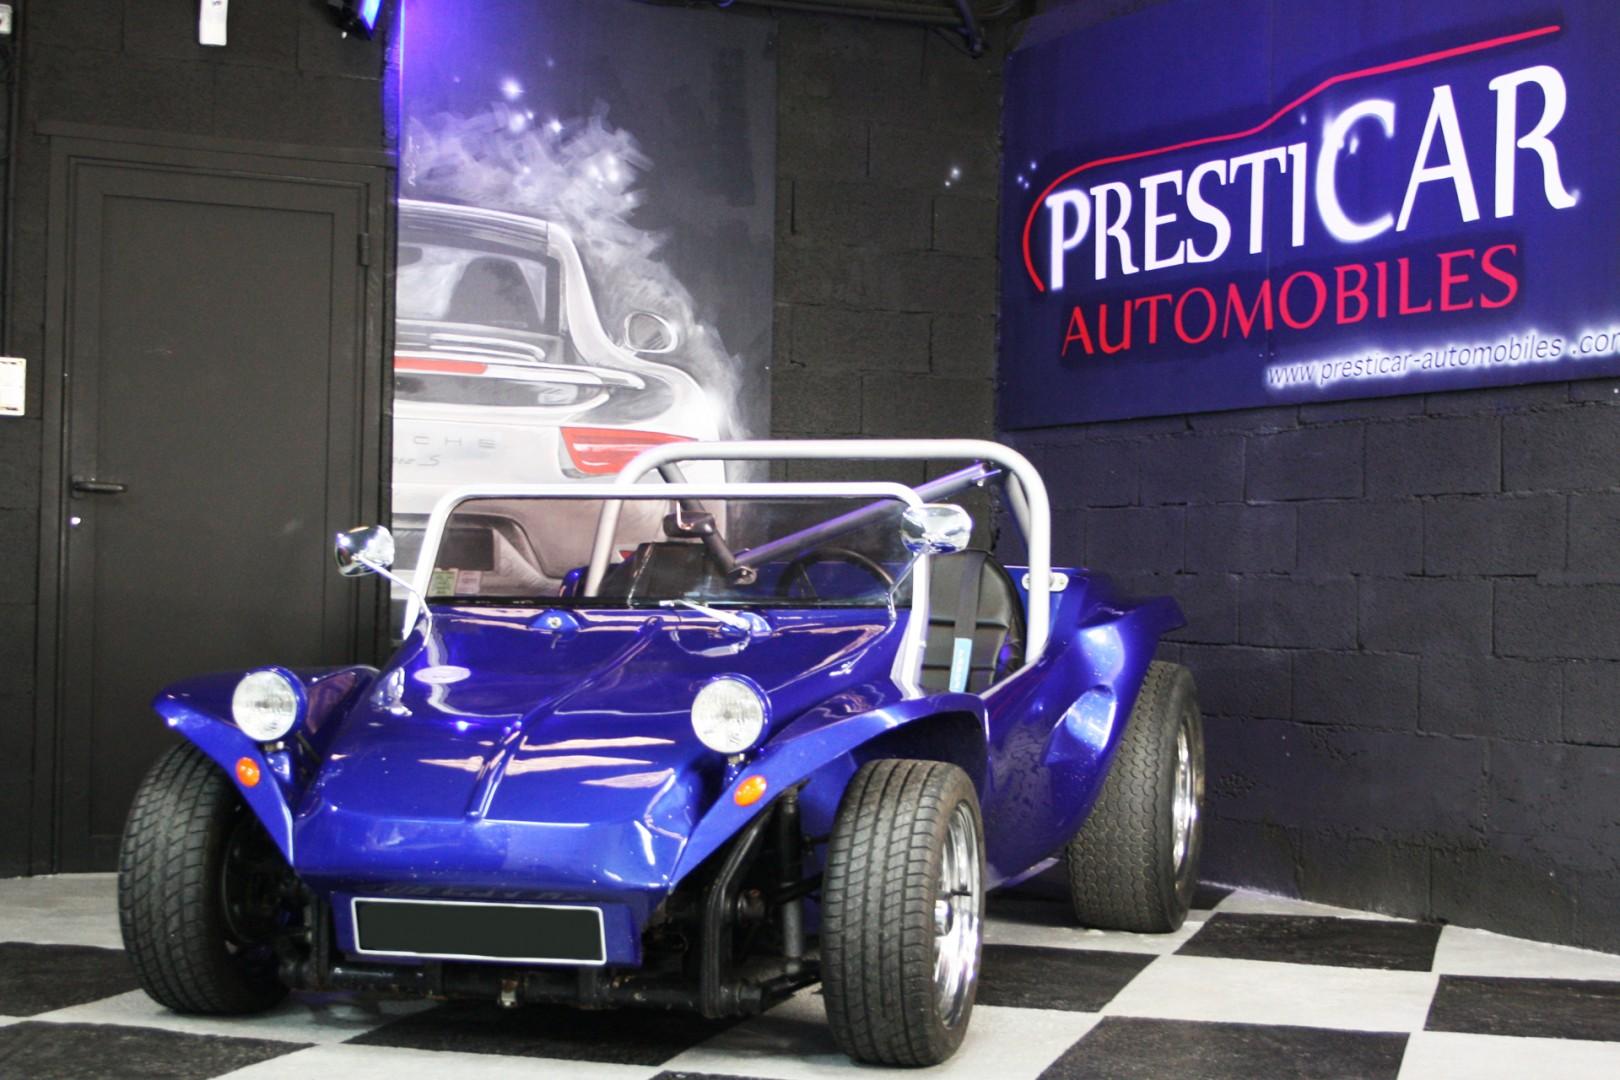 04 Mustang Gt >> VOLKSWAGEN Buggy LM1 1500 | Presticar Automobiles